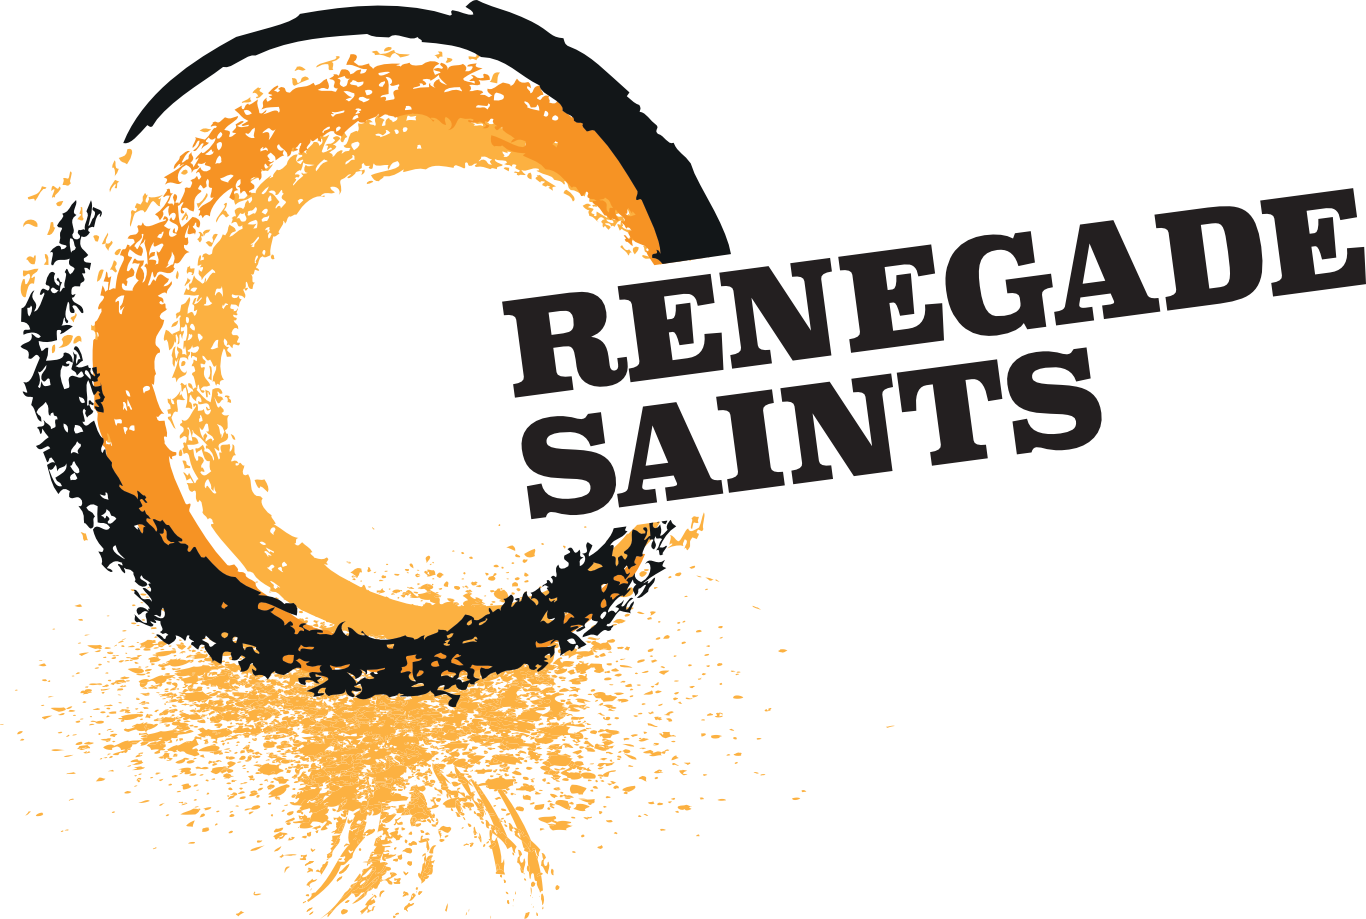 Renegade Saints